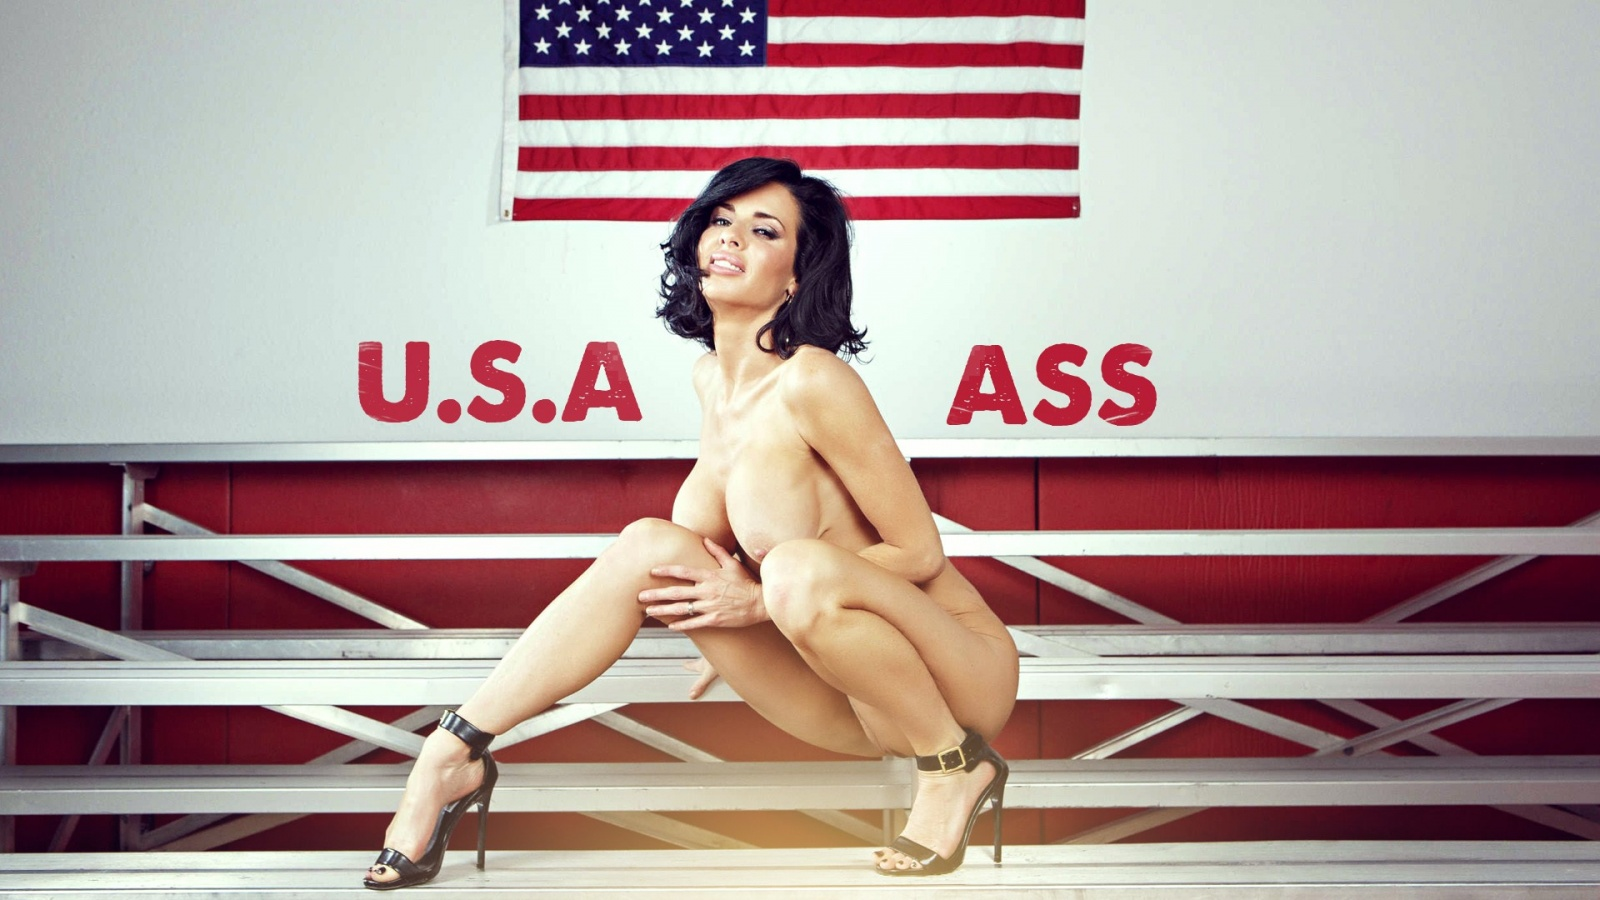 American Milf Nude american nude milf, hot busty brunette pornstar showing her